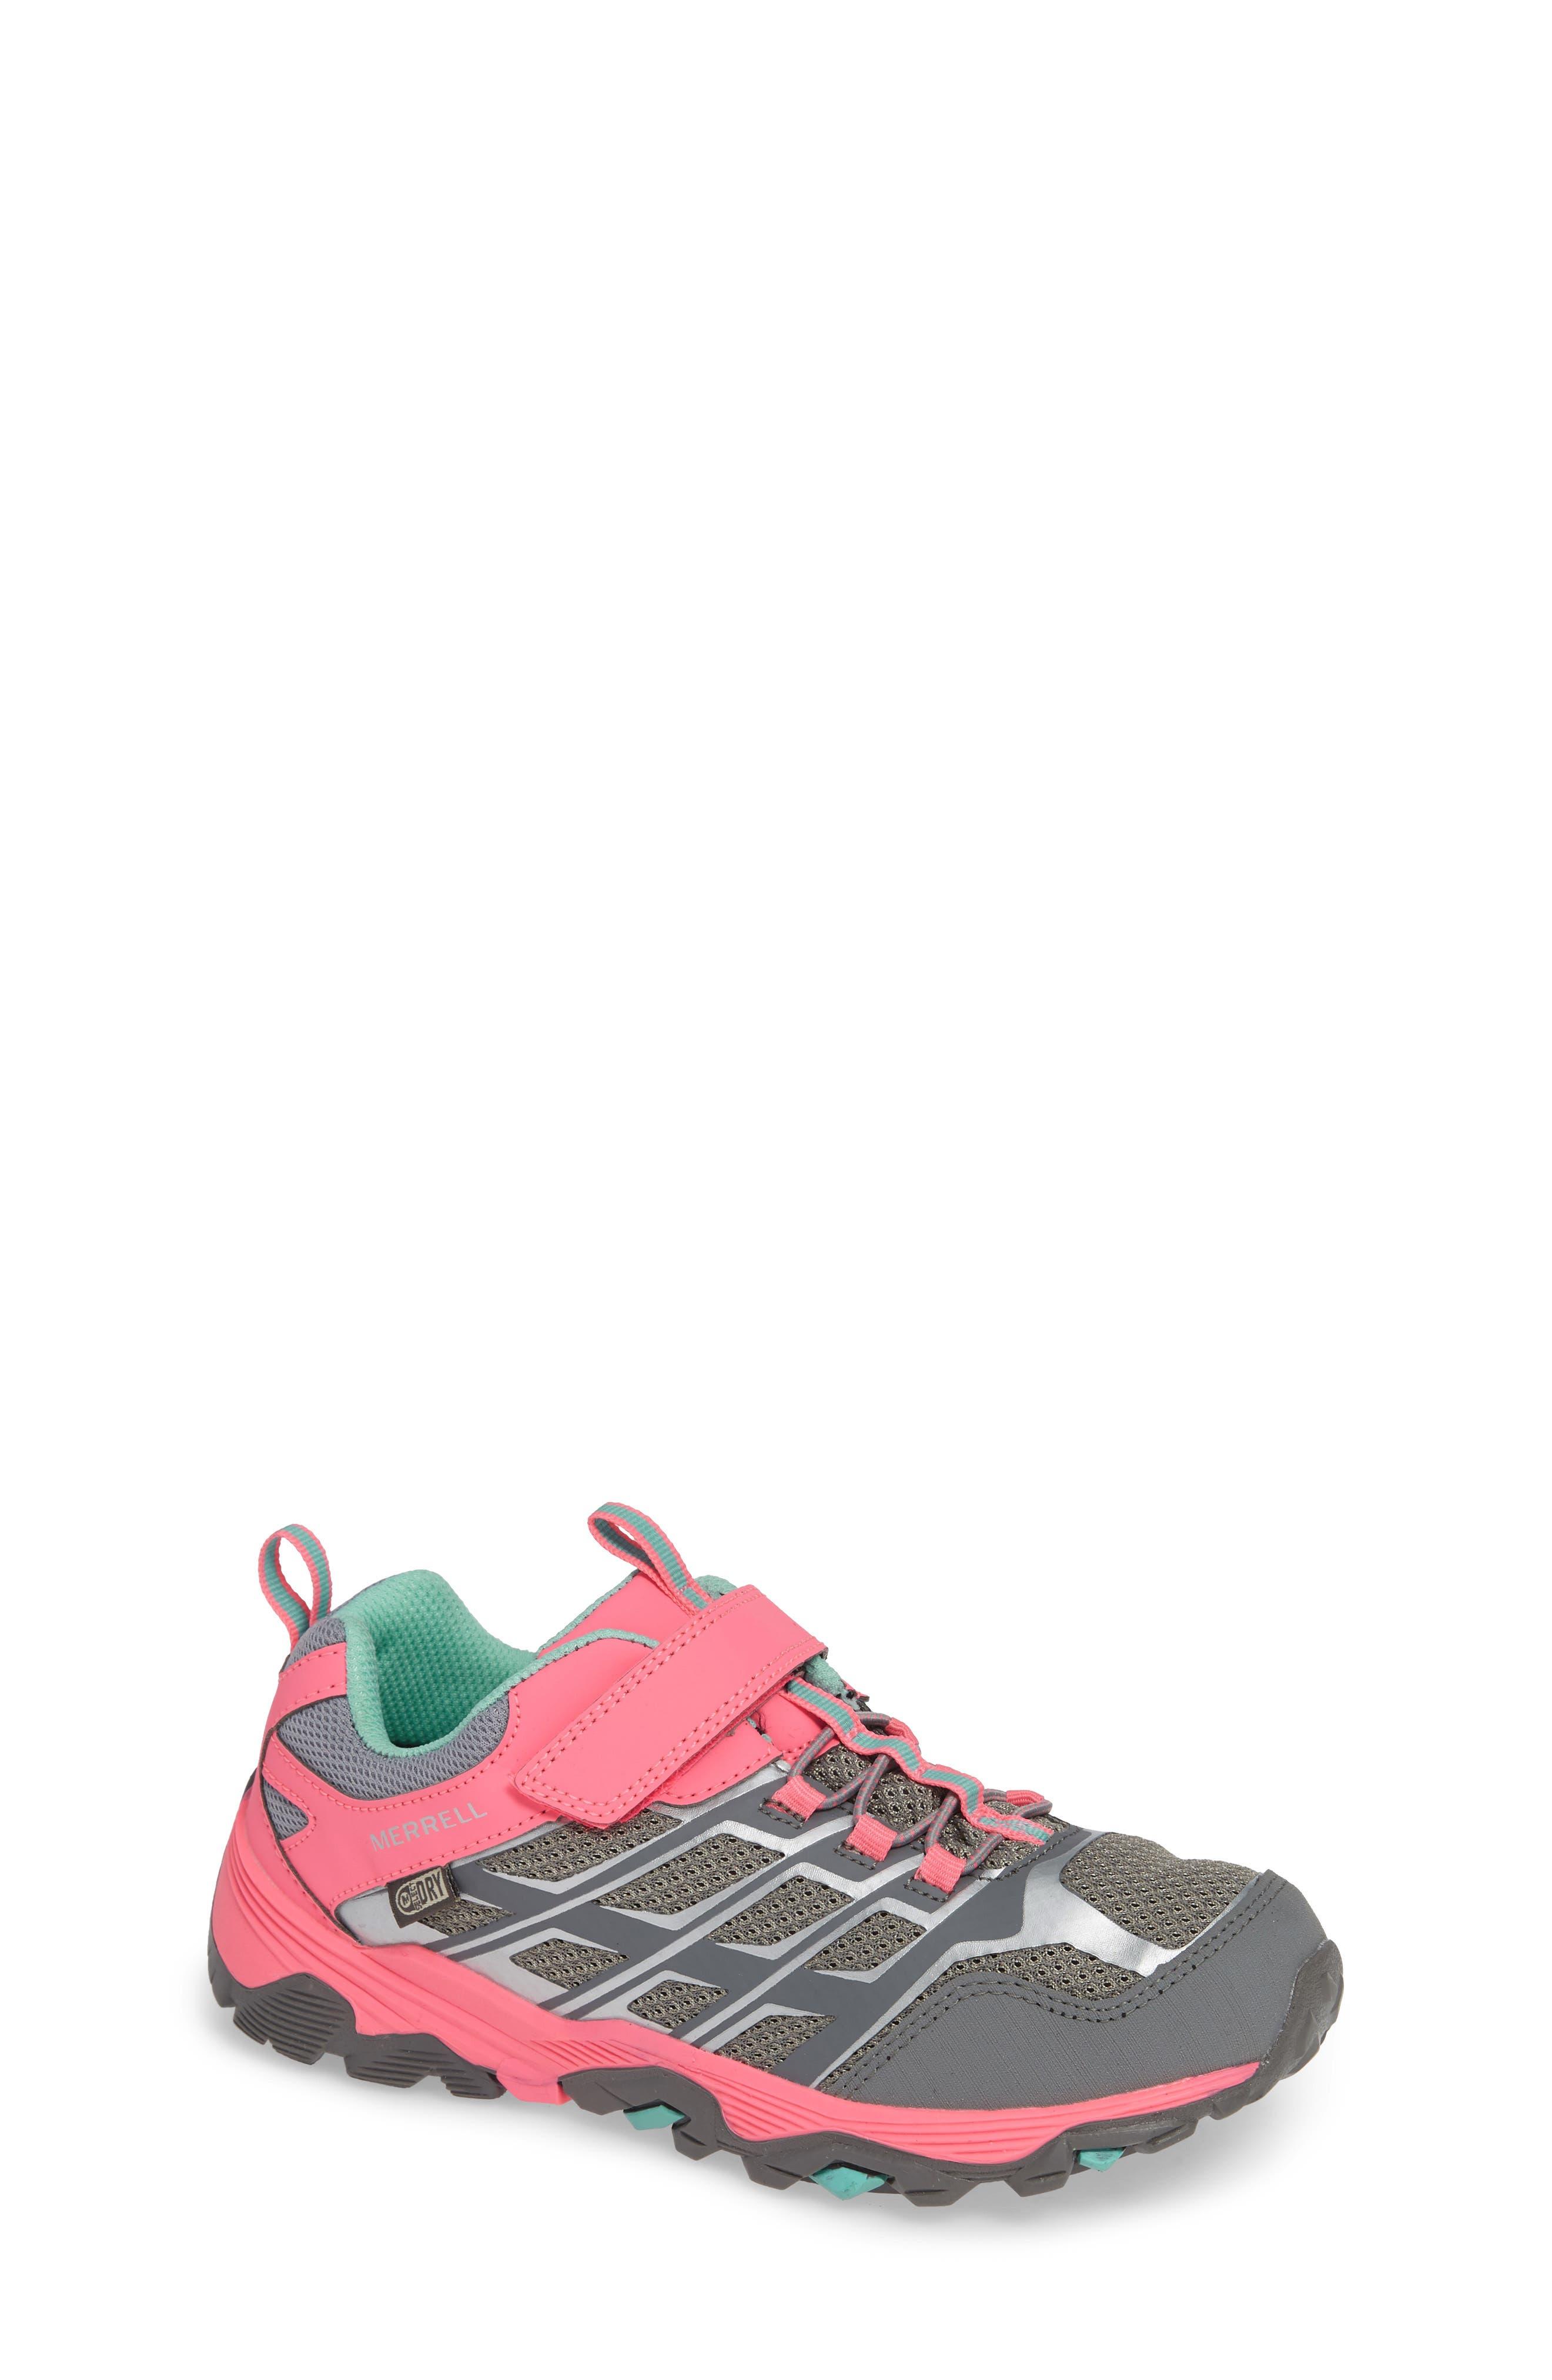 Moab FST Polar Low Waterproof Sneaker,                         Main,                         color, GREY/ CORAL